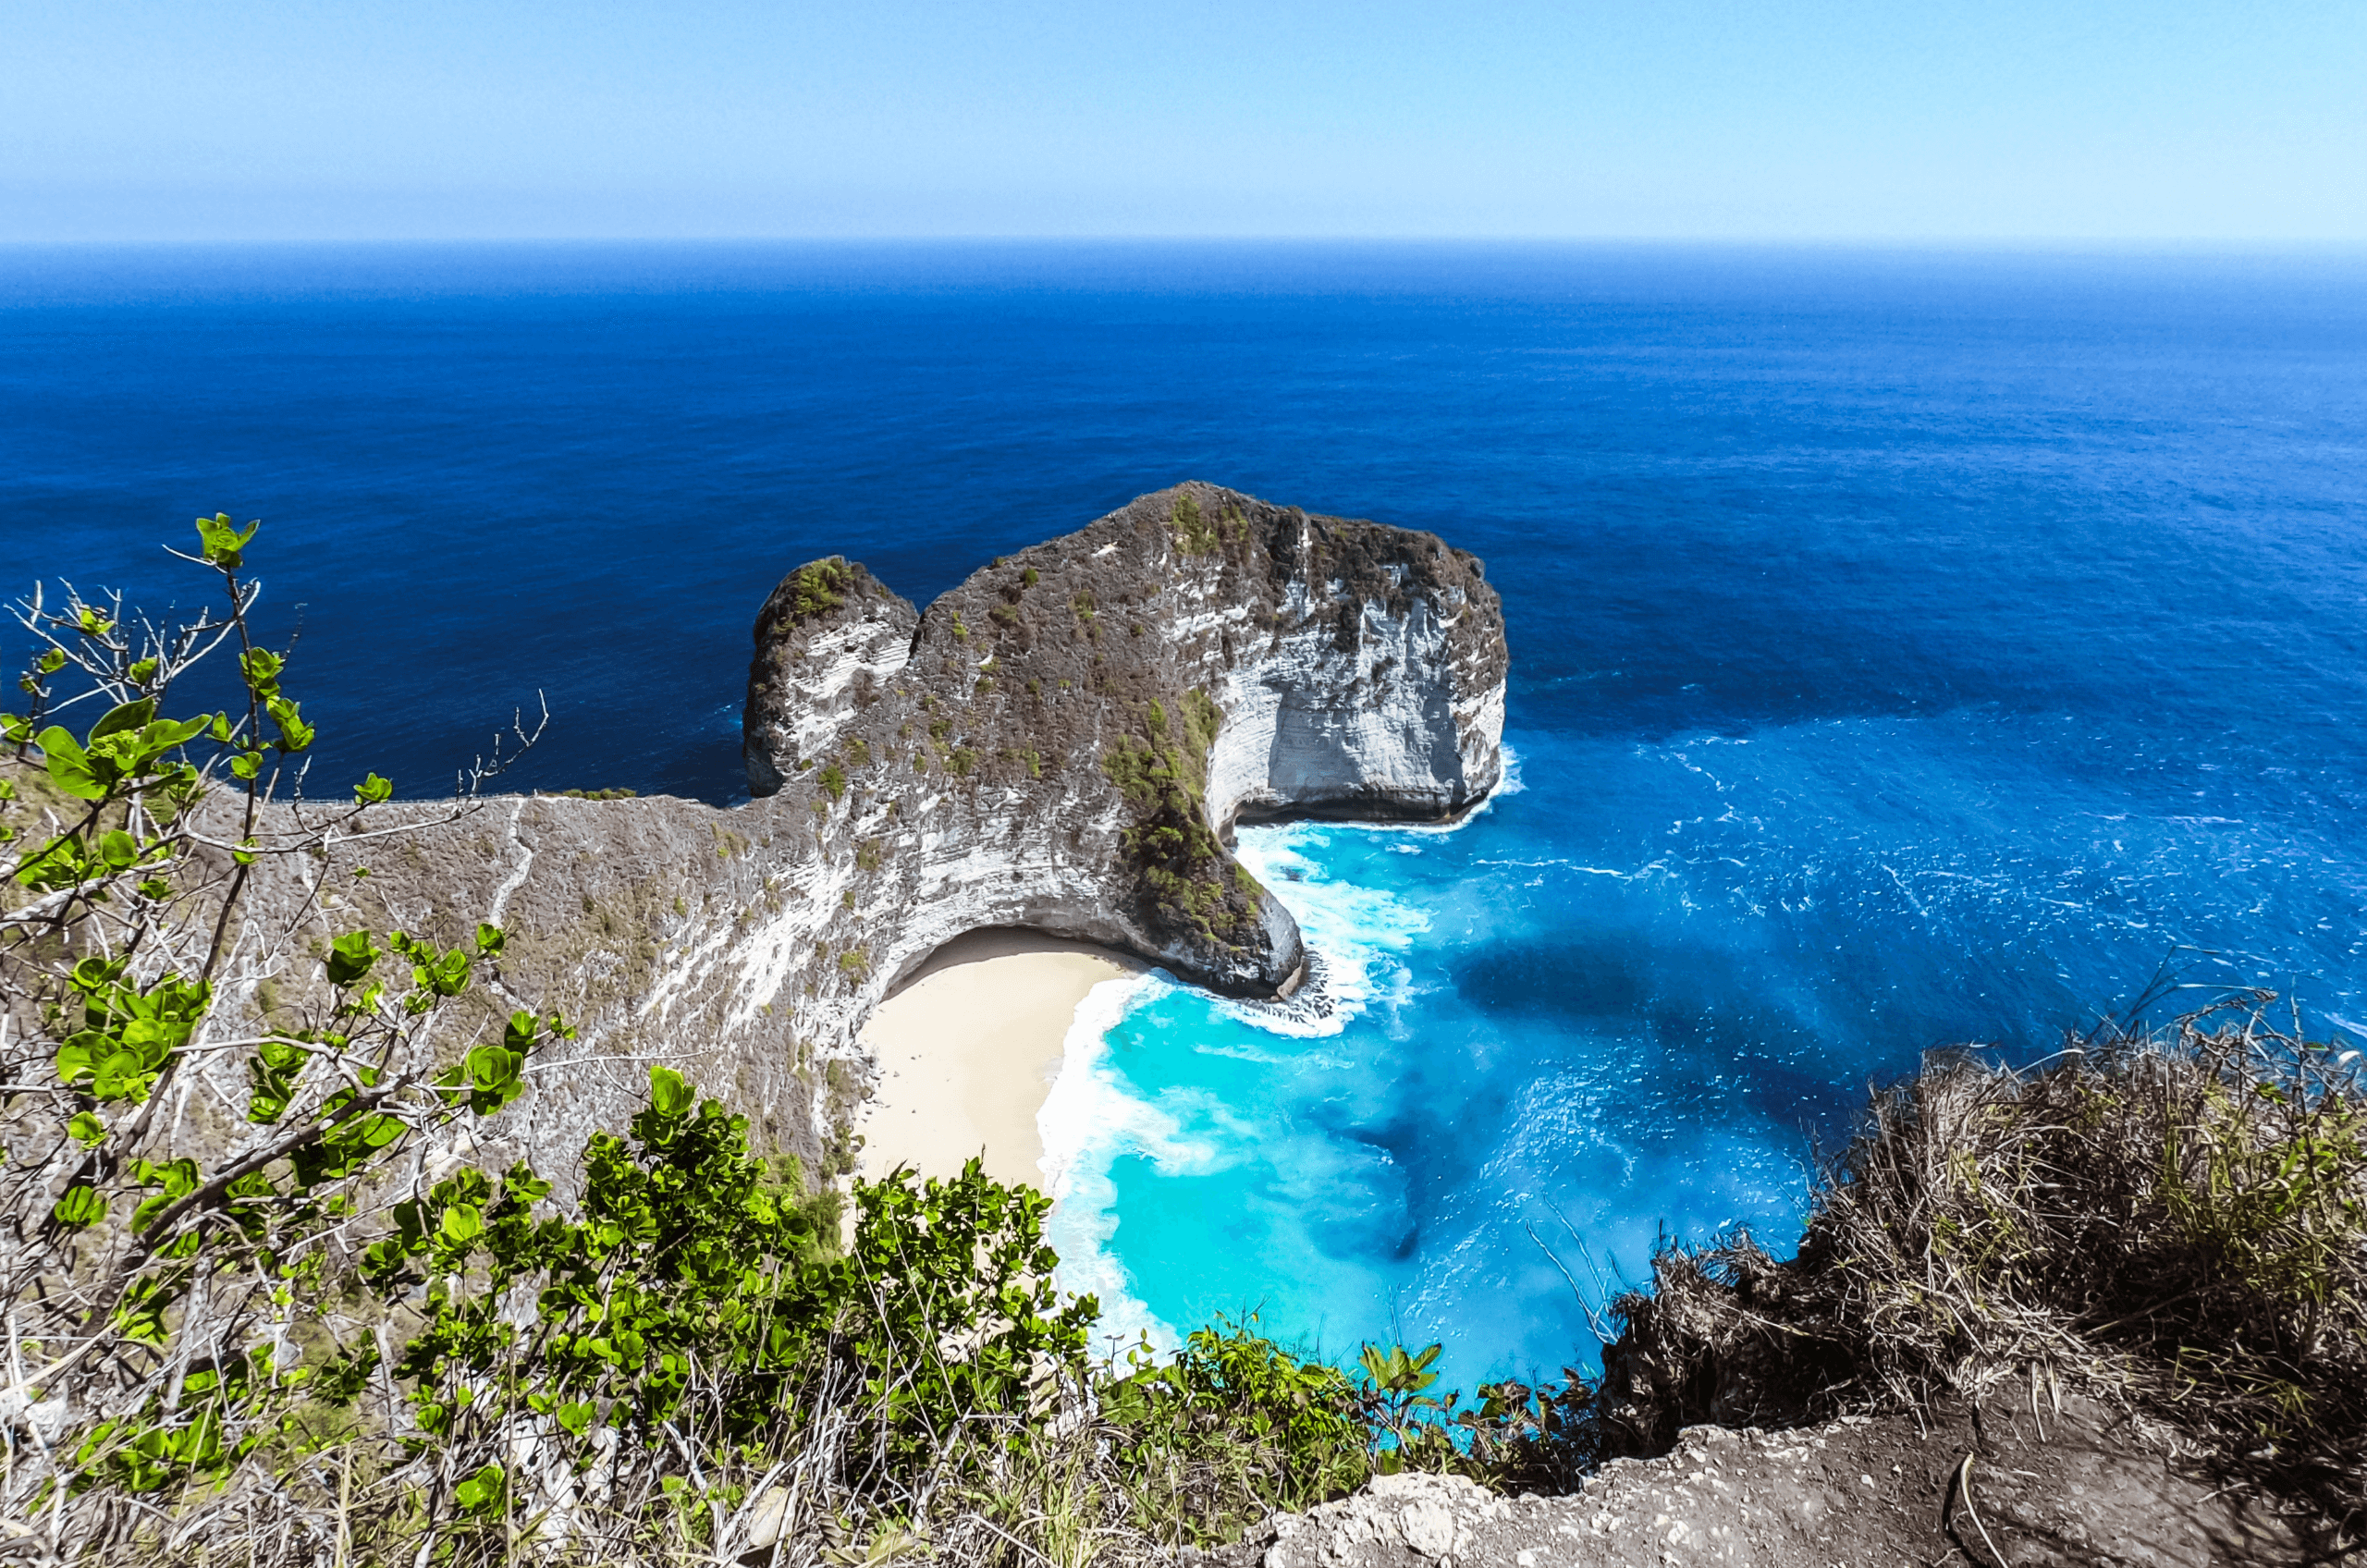 1 day guide for Nusa Penida island